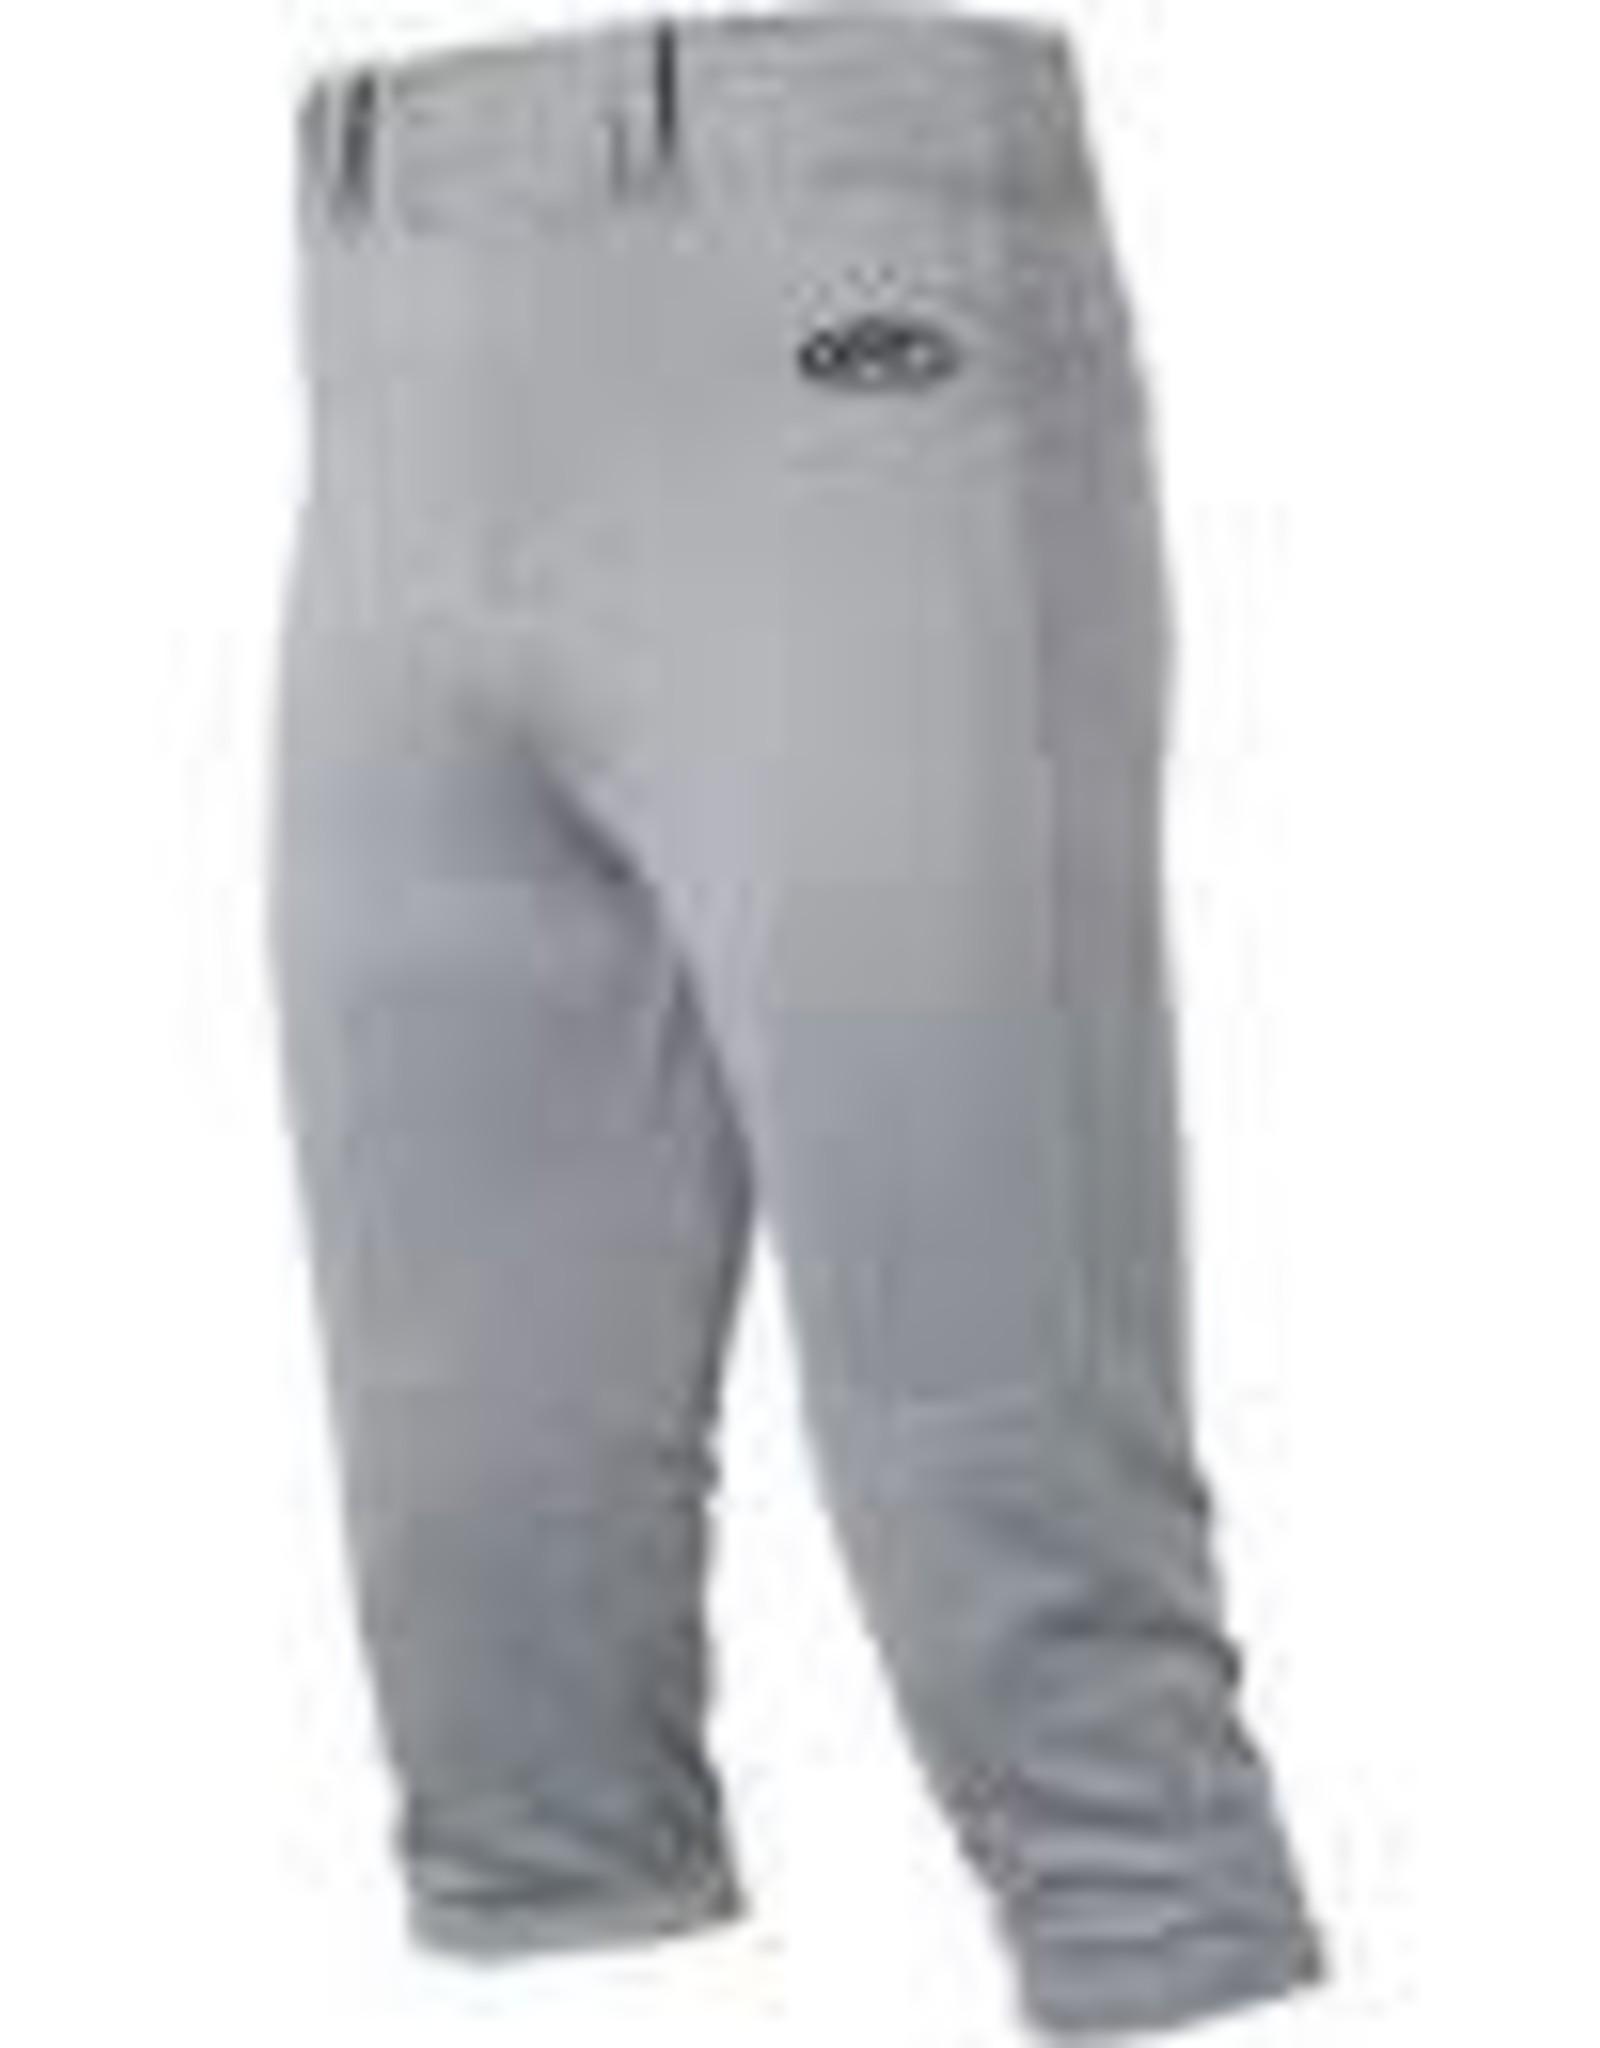 Rawlings Adult Launch Knicker Pant Bluegrey (M) (elastique)